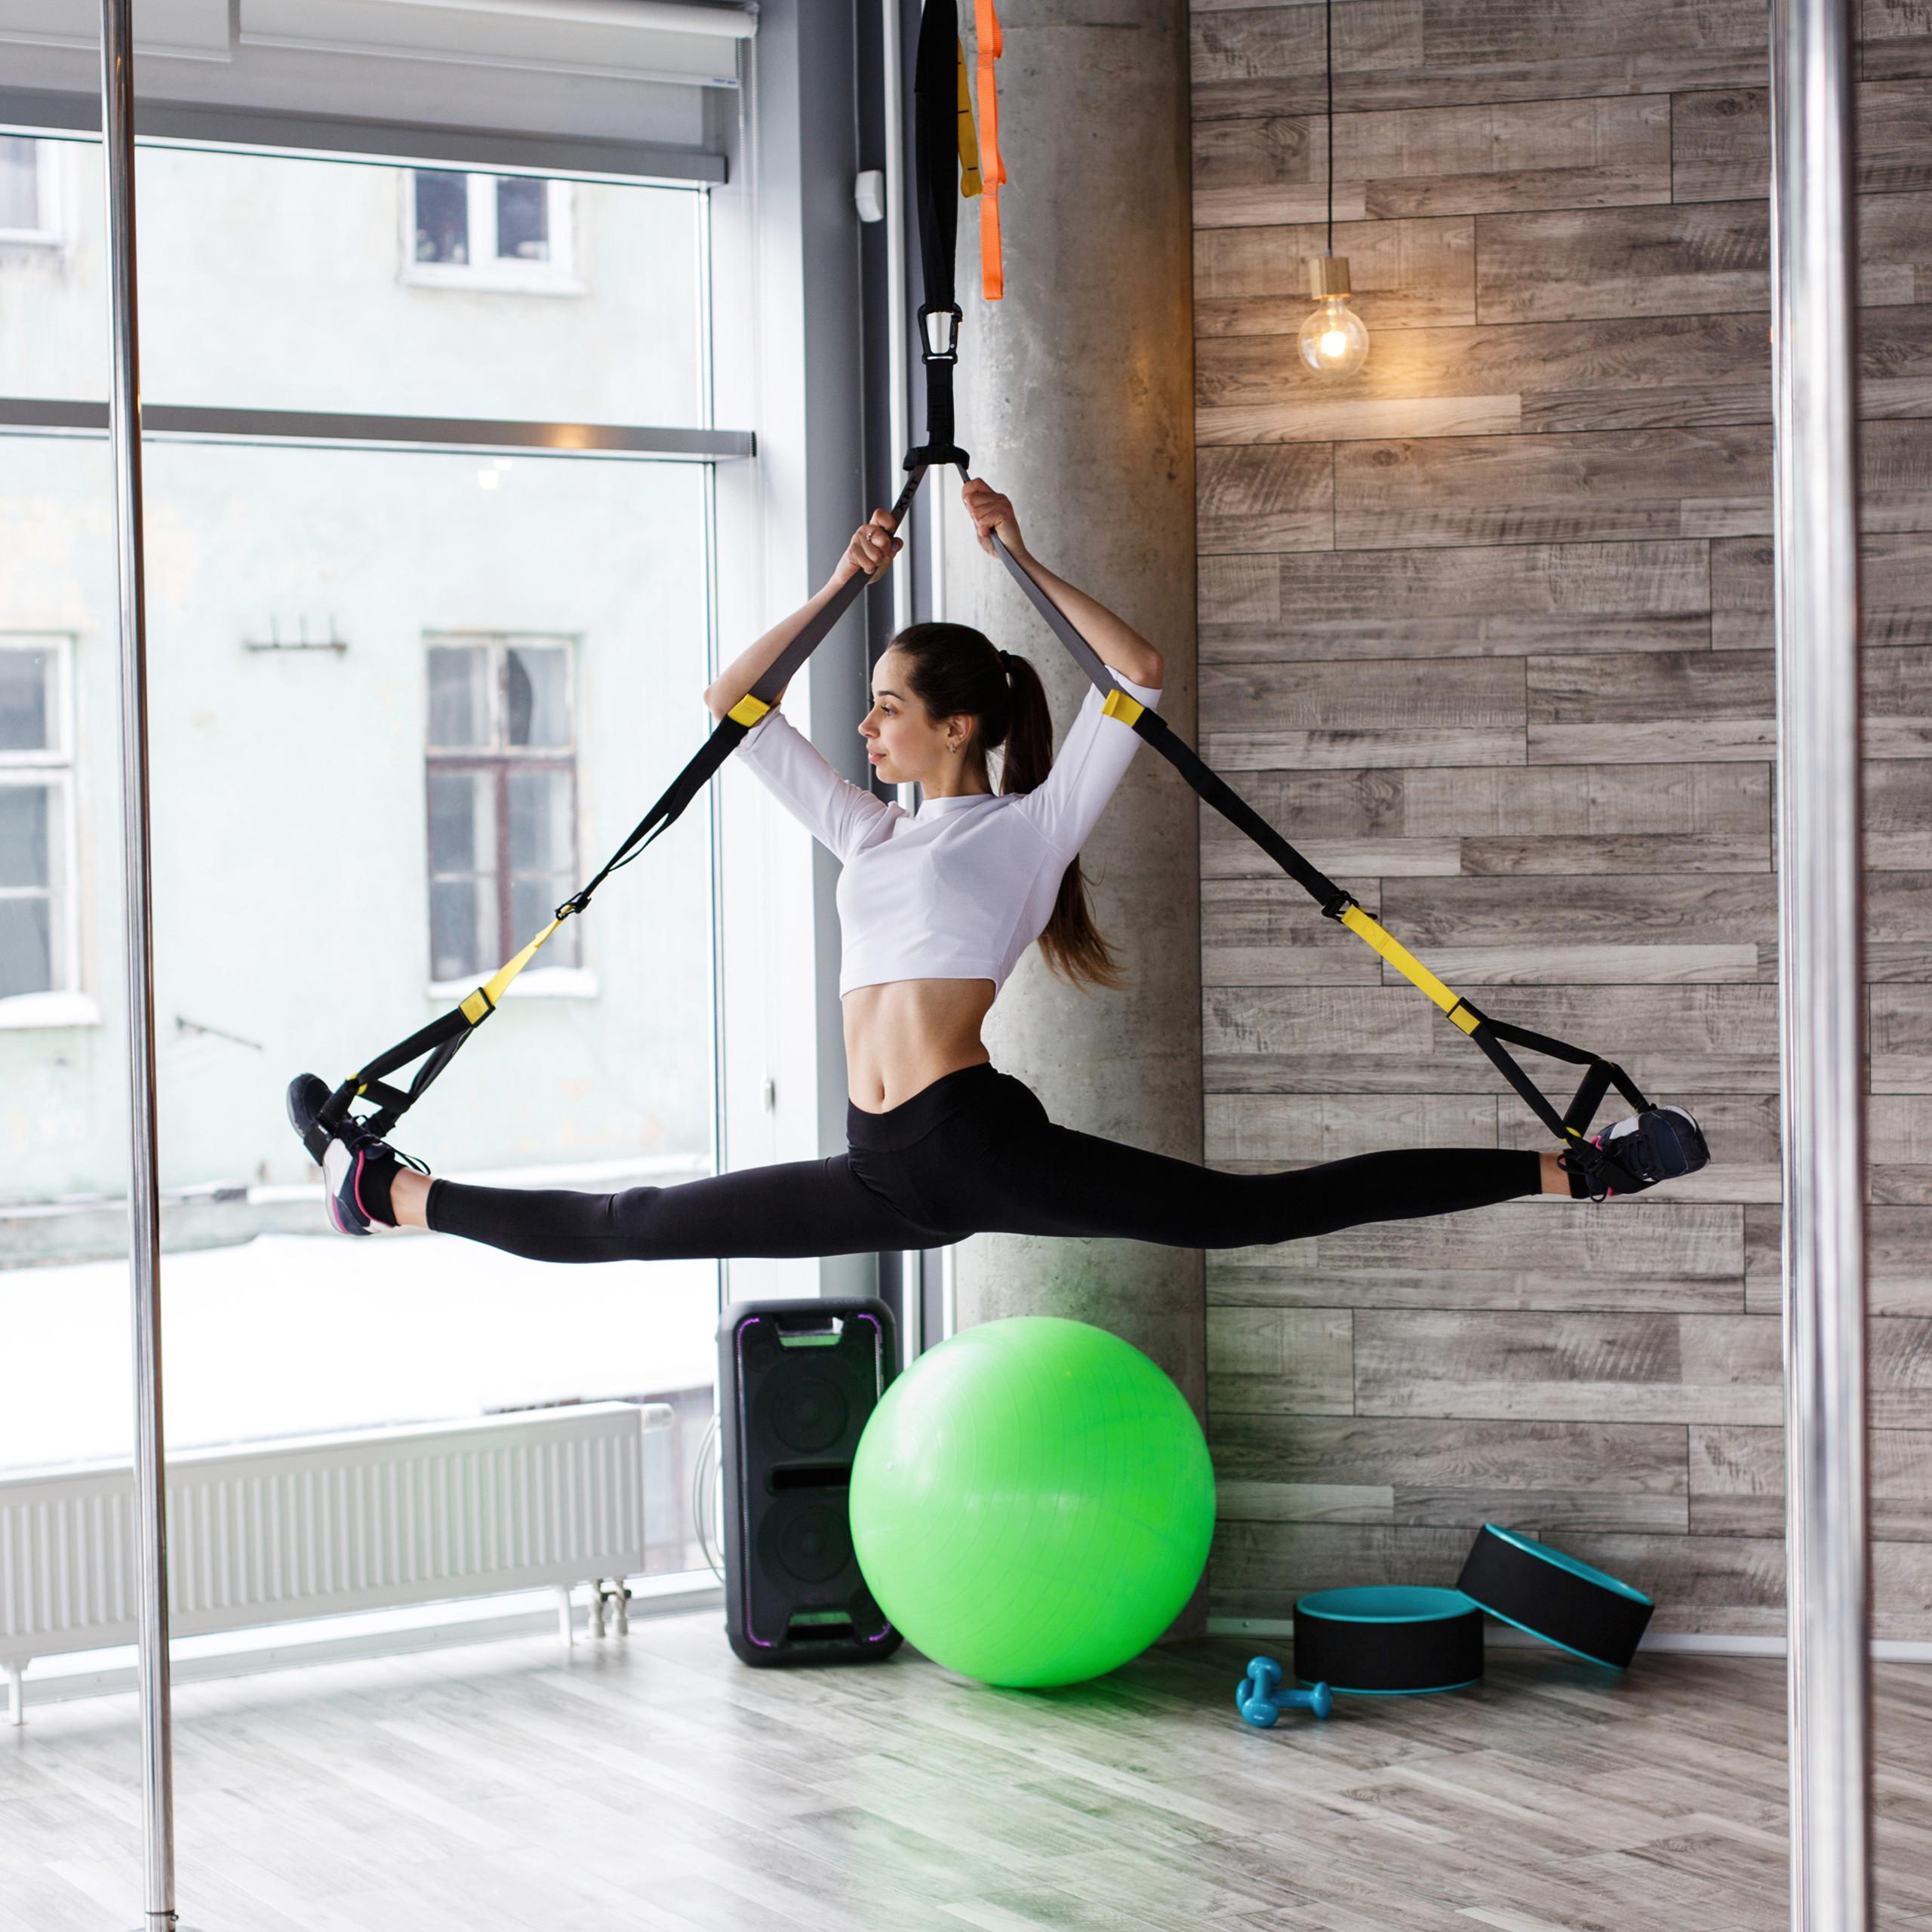 Exercise-Ball-75-cm-PVC-Yoga-Ball-Office-Seat-Gym-Ball-Pilates thumbnail 13